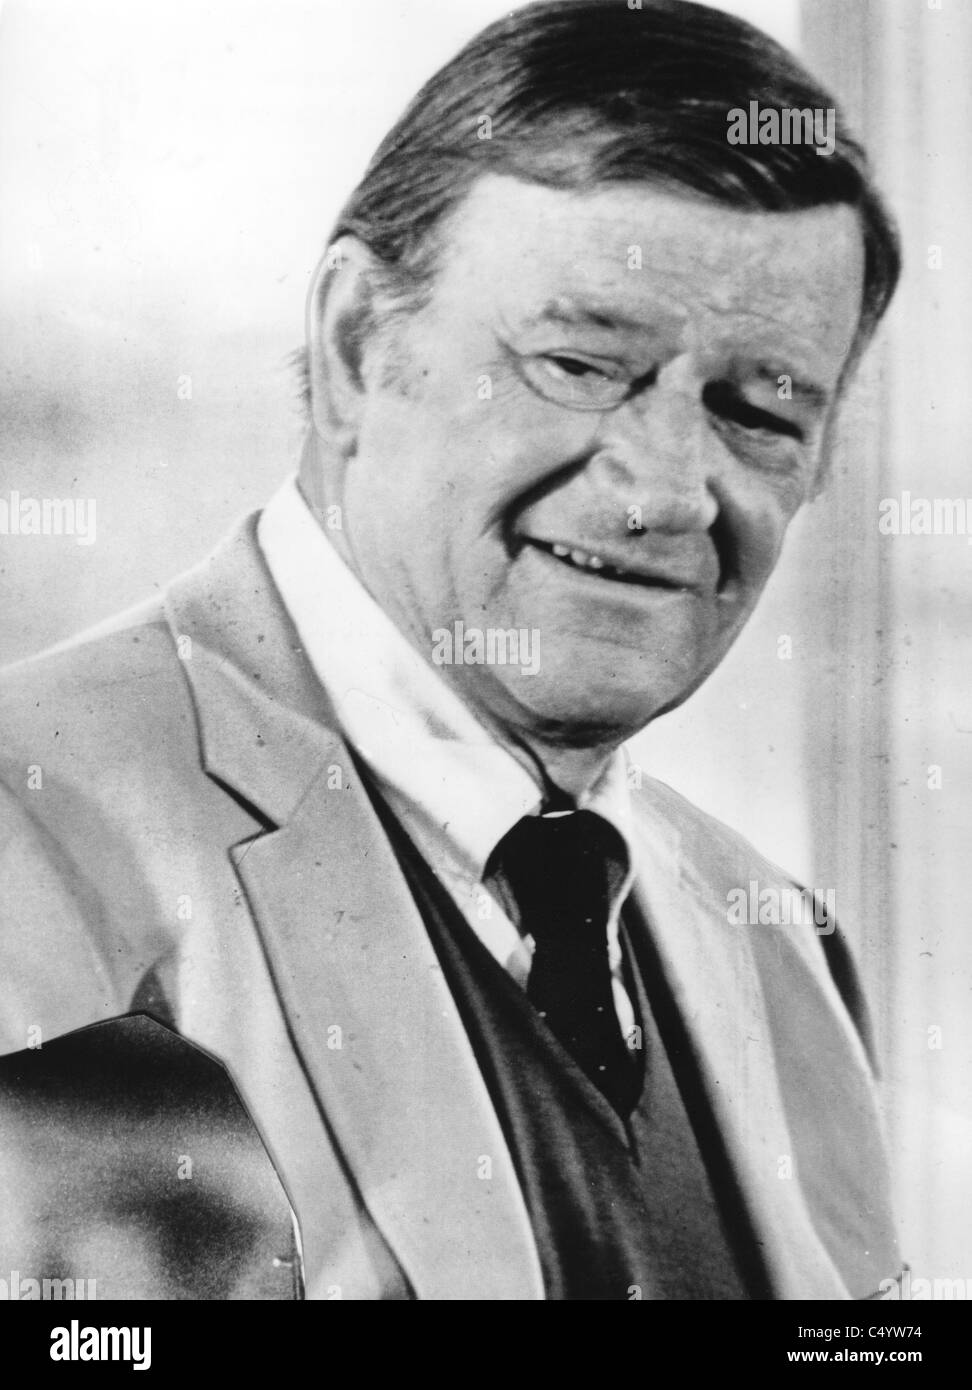 John Wayne, - Stock Image